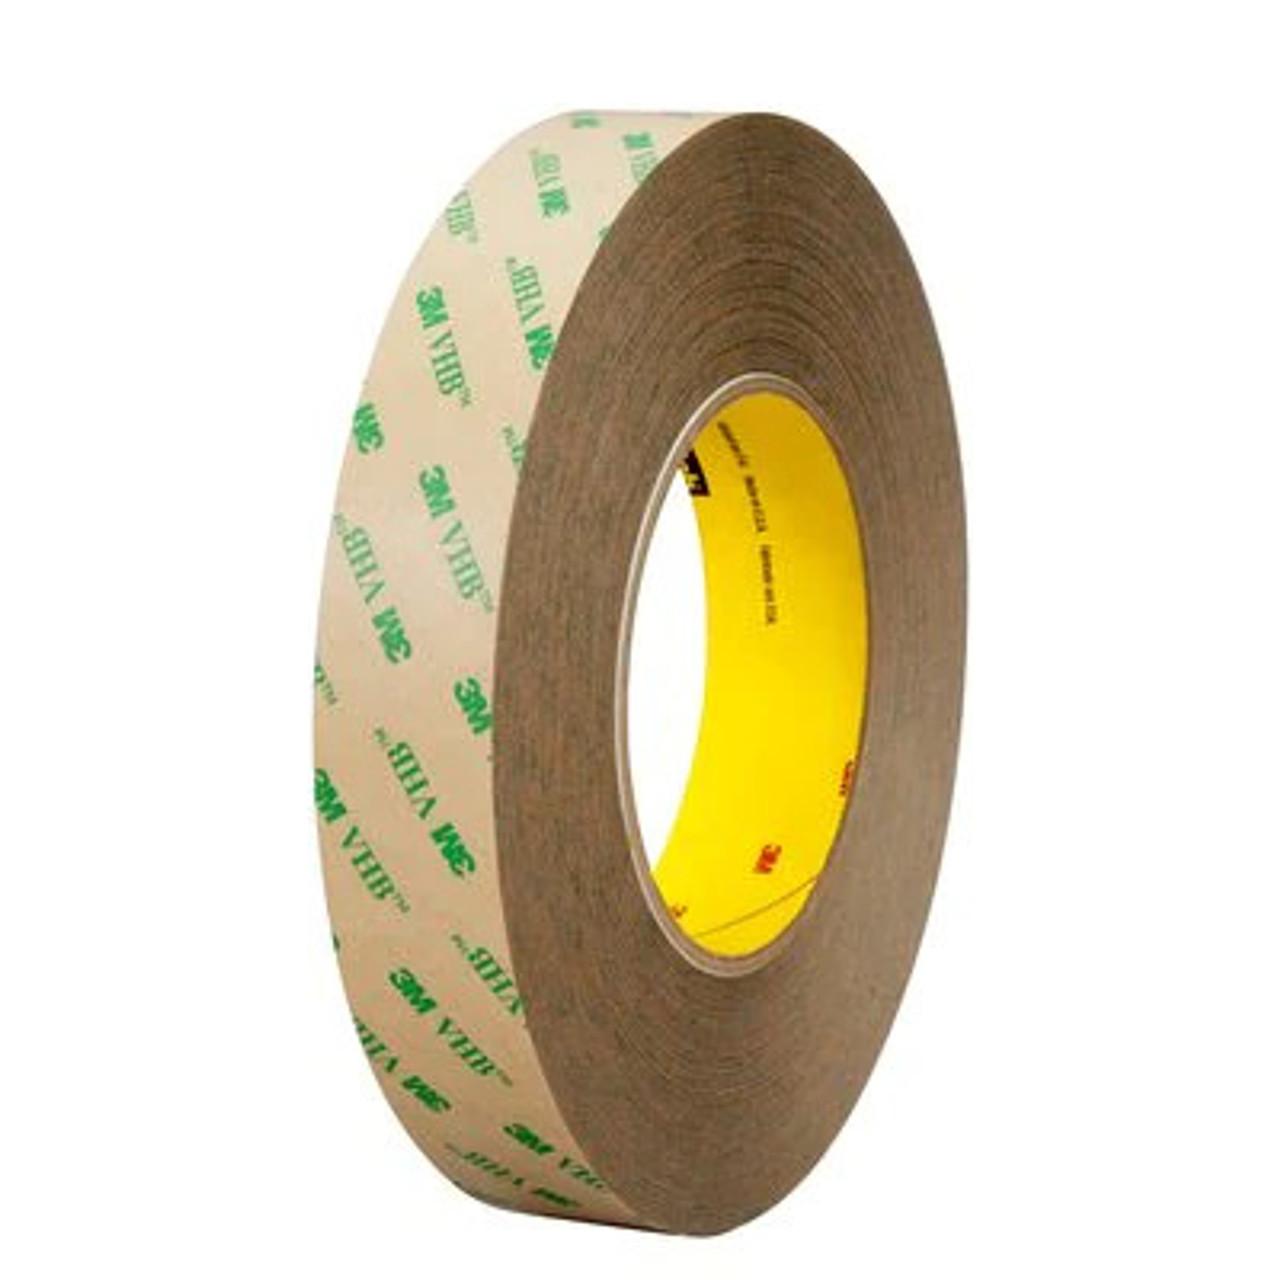 3M™ VHB™ Adhesive Transfer Tape F9469PC, Clear, 1 in x 60 yd, 5 mil